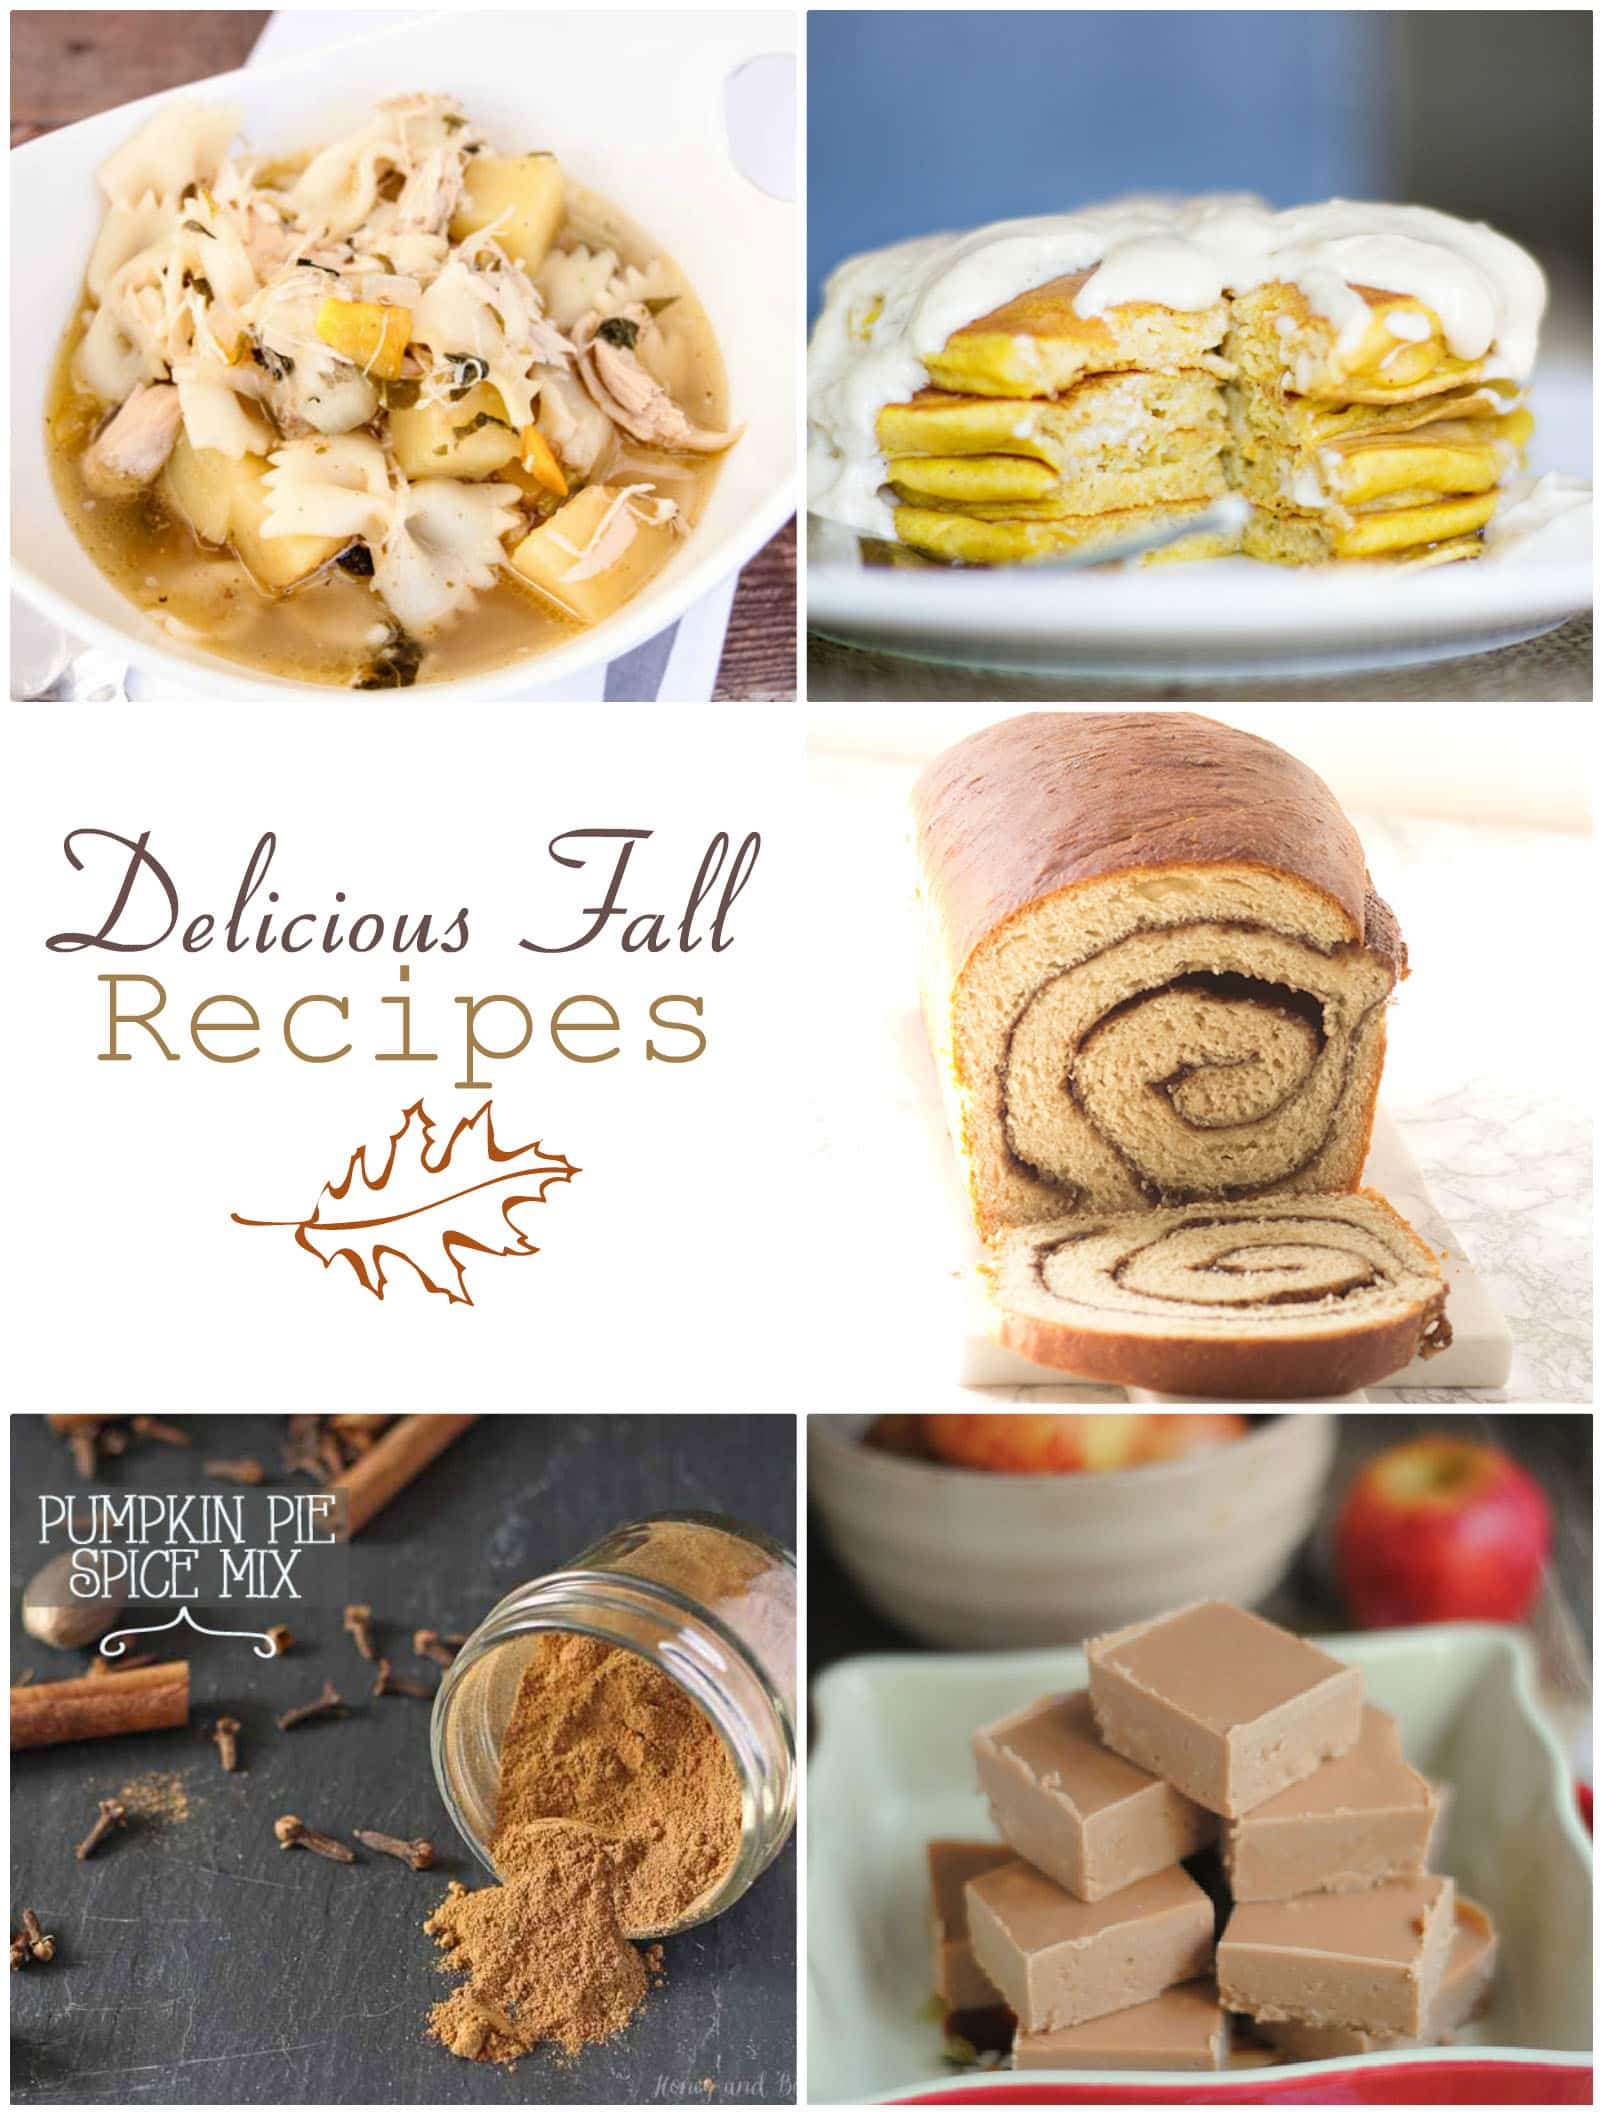 Delicious Fall Recipes Maison De Pax